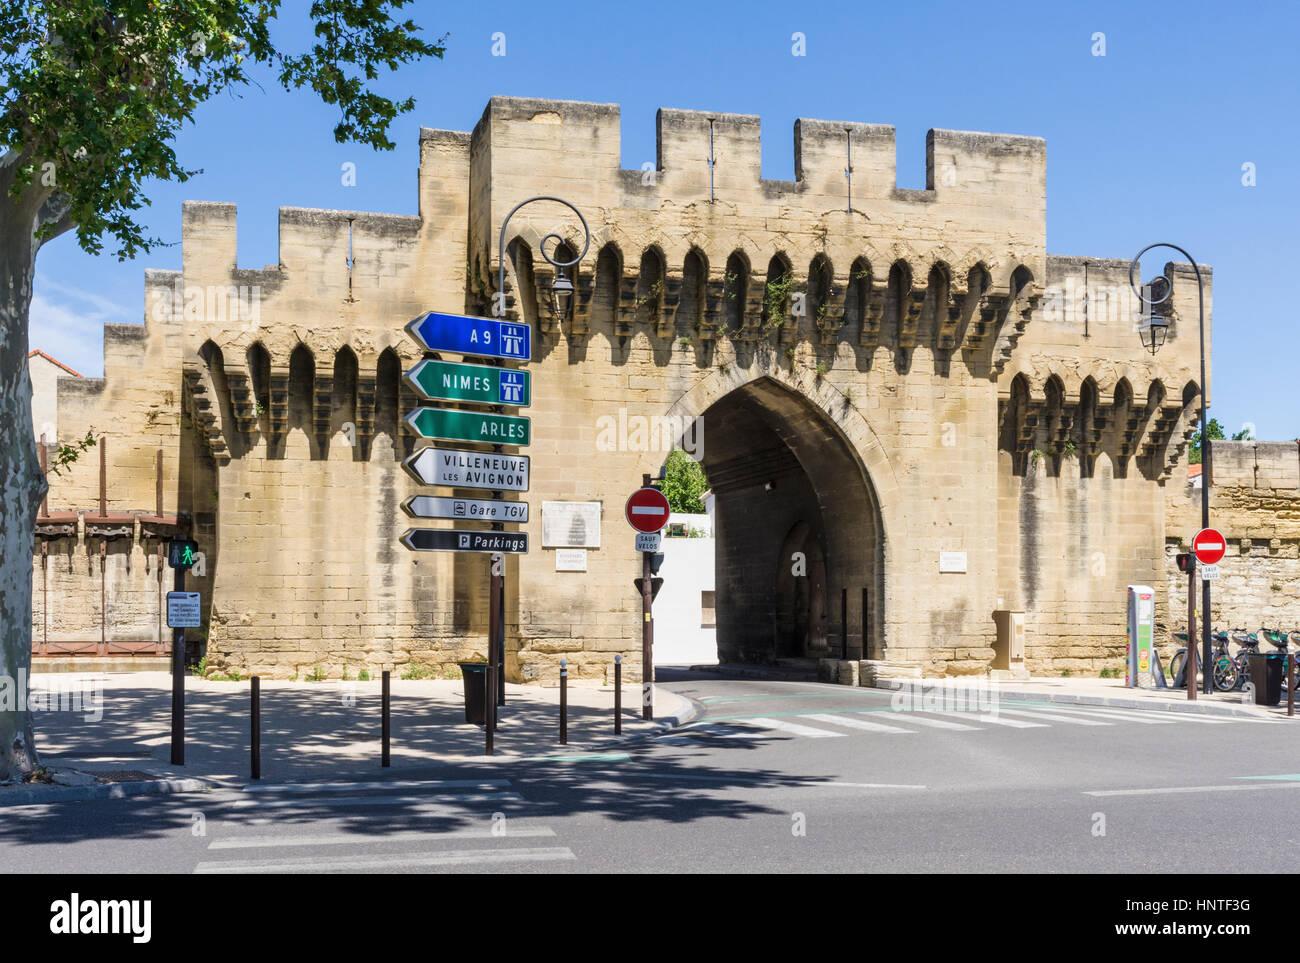 Avignon france stock photos avignon france stock images alamy - Porte saint dominique avignon ...